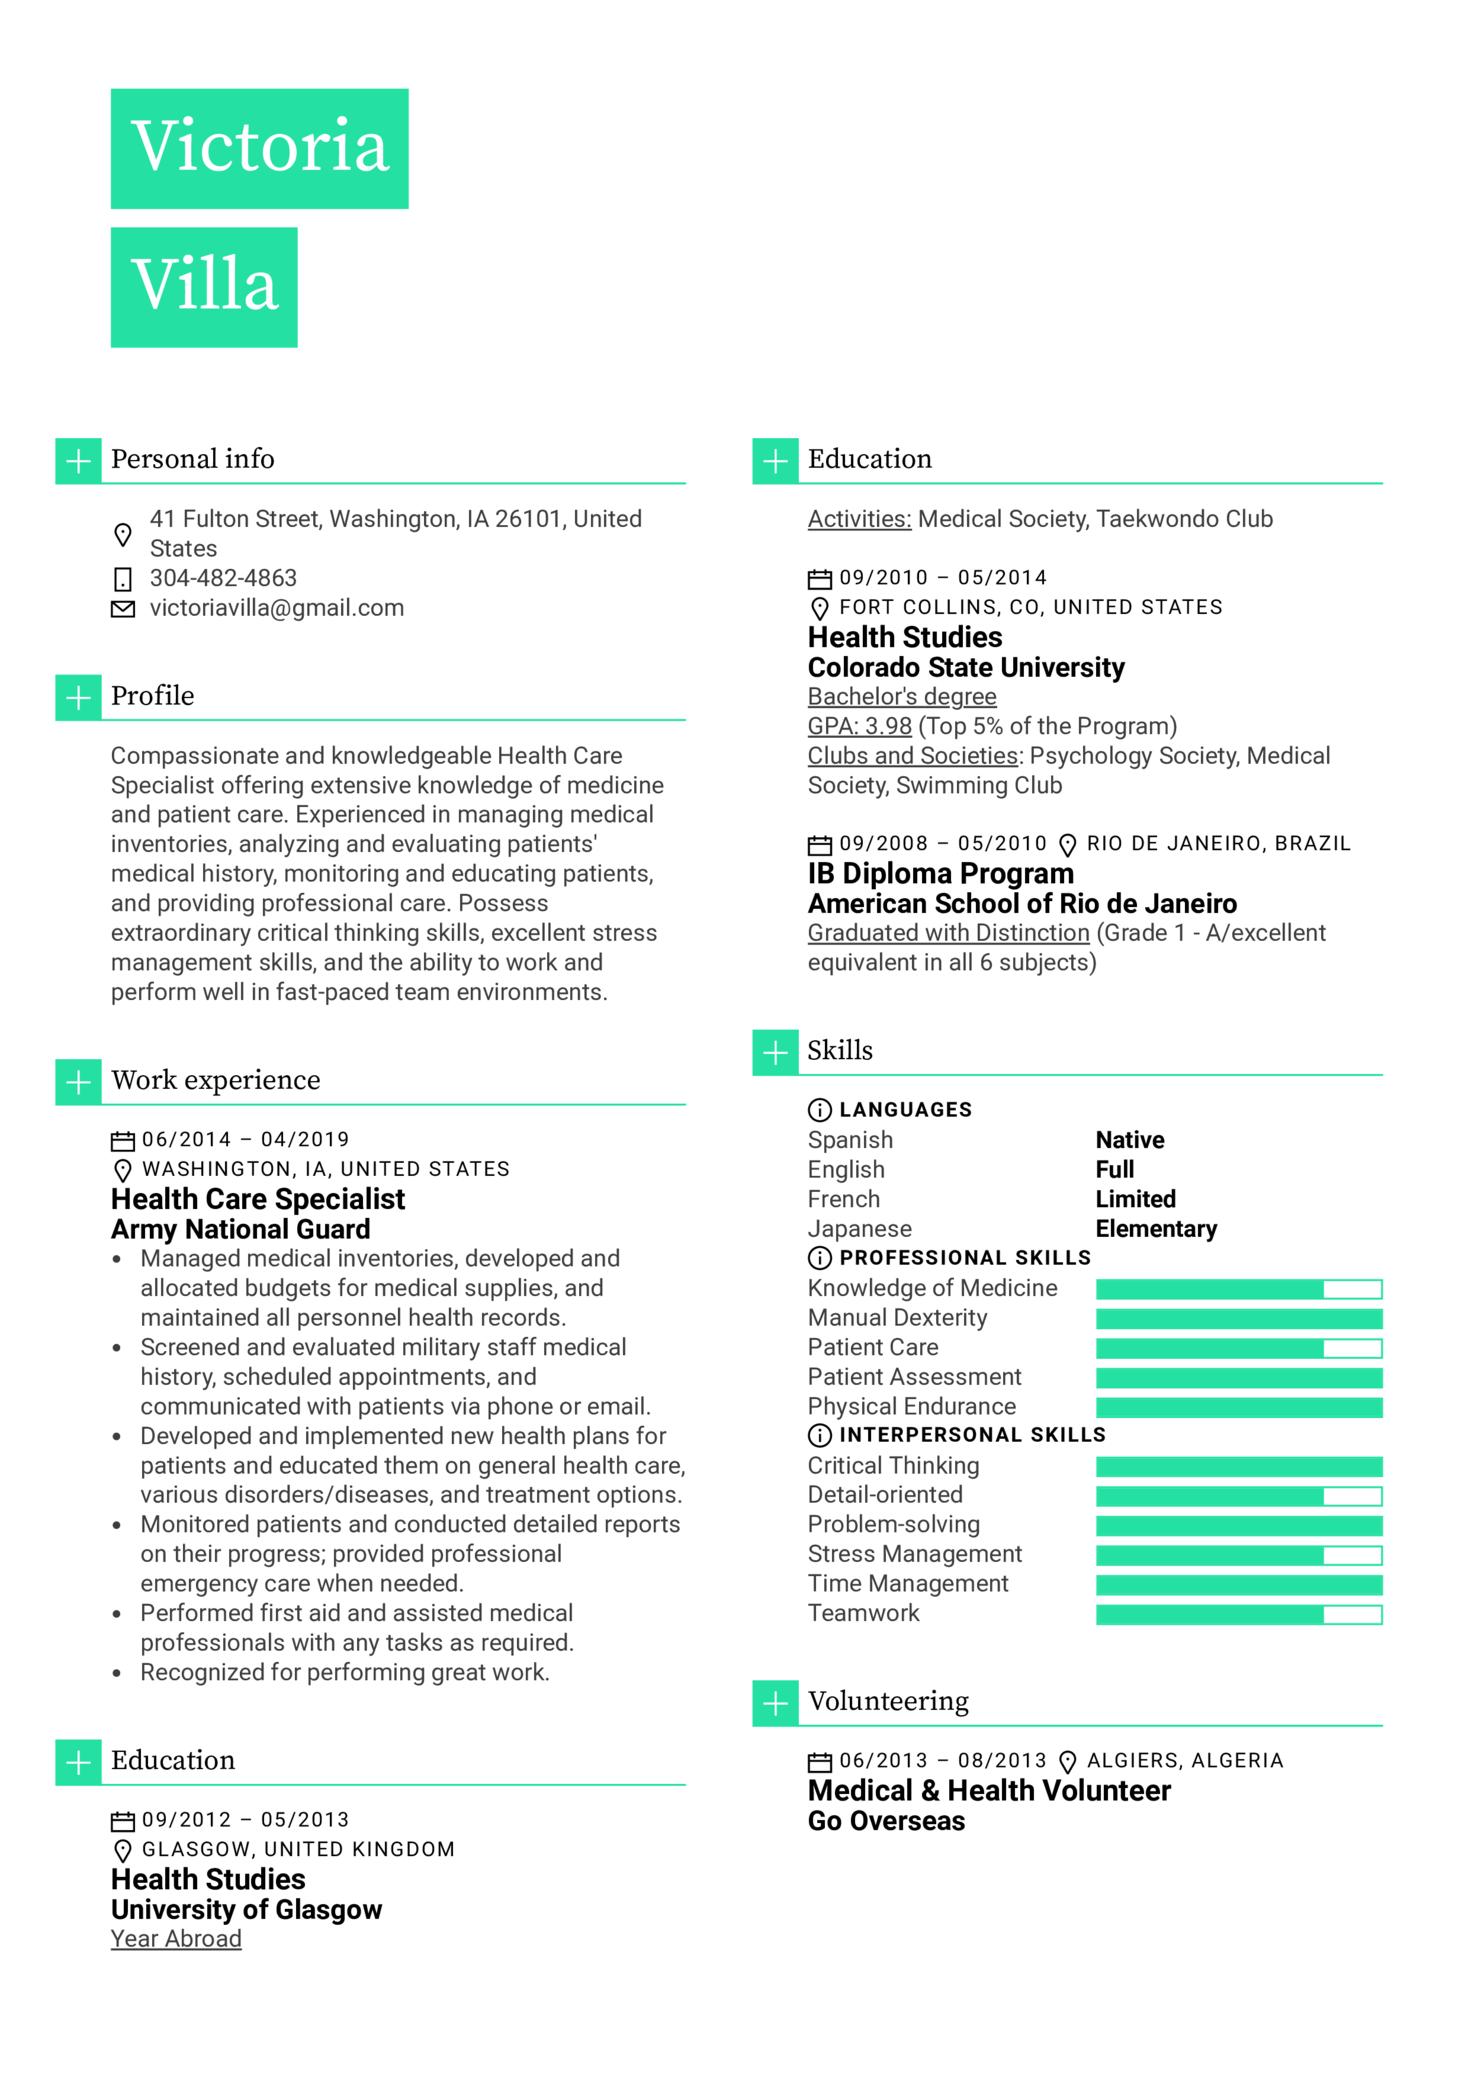 Healthcare Specialist Resume Example (parte 1)